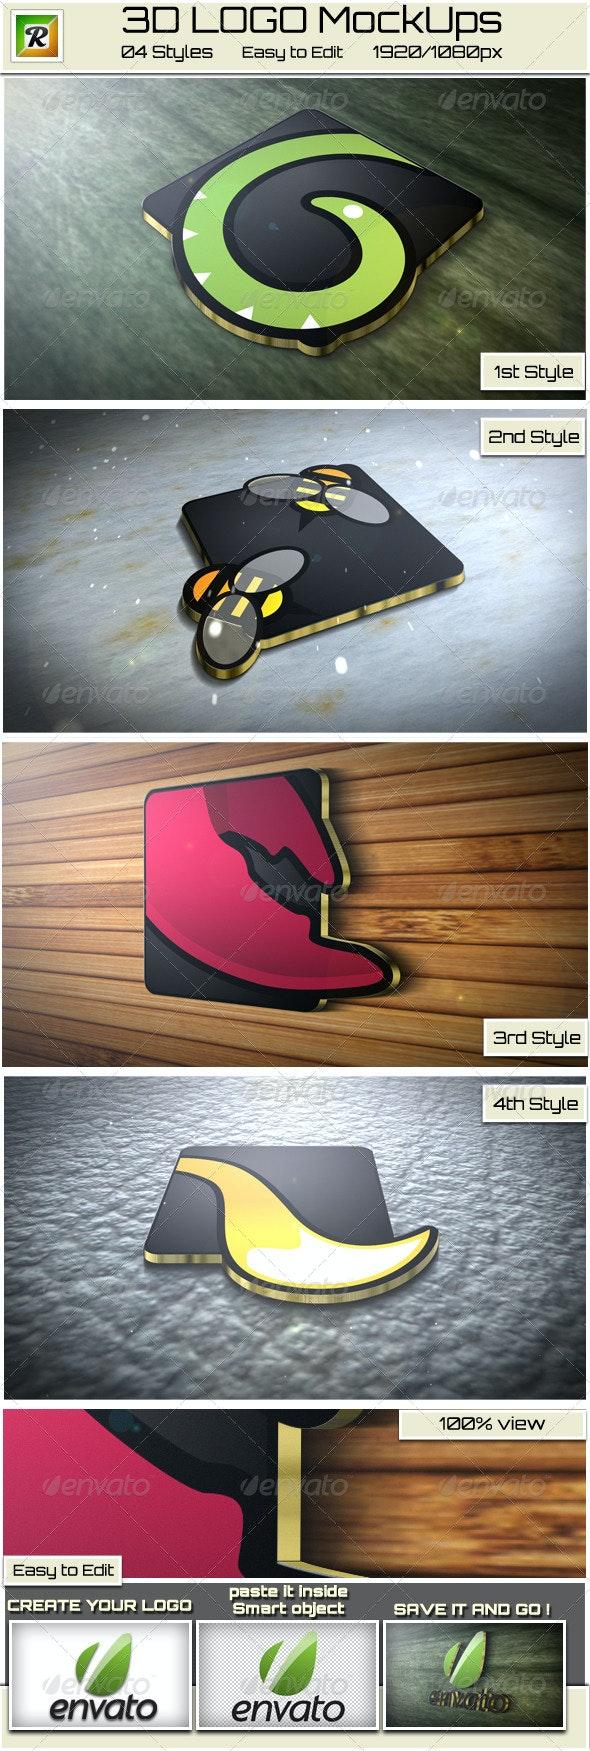 Realistic 3D Logo Mock-up - Logo Product Mock-Ups